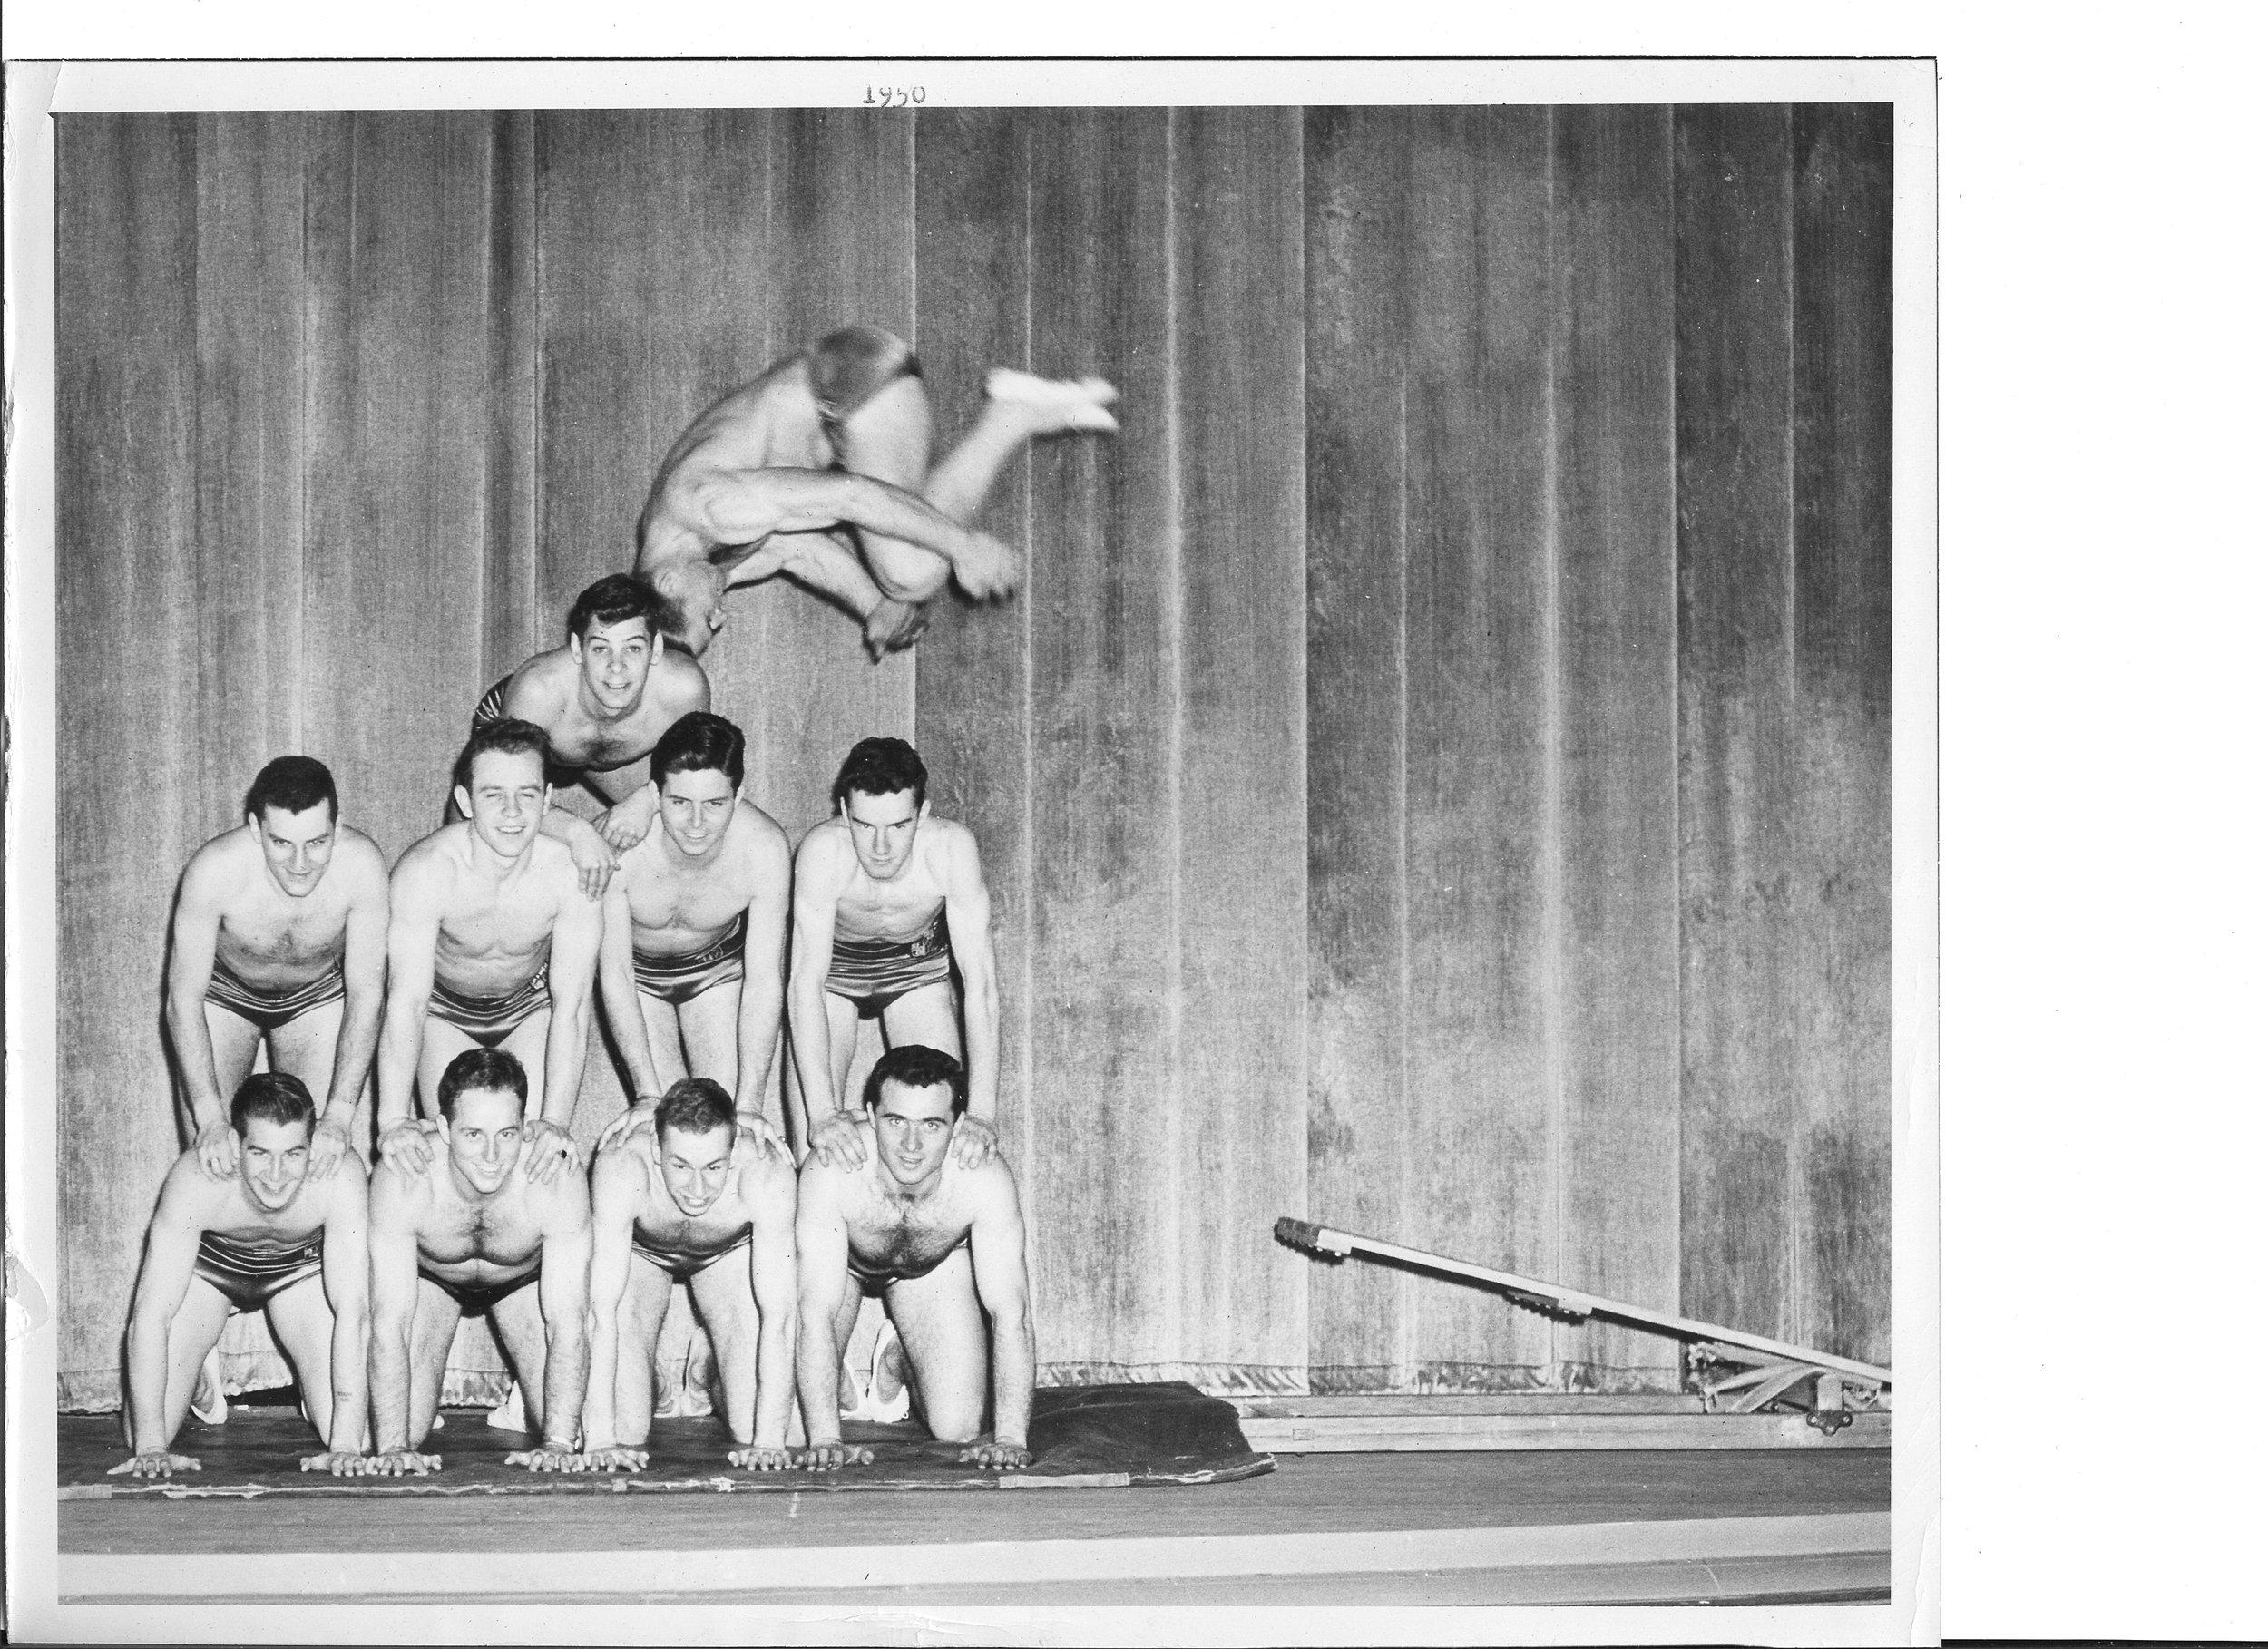 1950 Tony Lisehora somersaults Bot. l - r Tom Sisk, Chuck Finch, Rolf Scovell, Bob Hooper Cen. l - r Chuck Fulton, Harold Buckley, John Wilkerson, Bob Caruthers top Tom Bolgiano.jpg